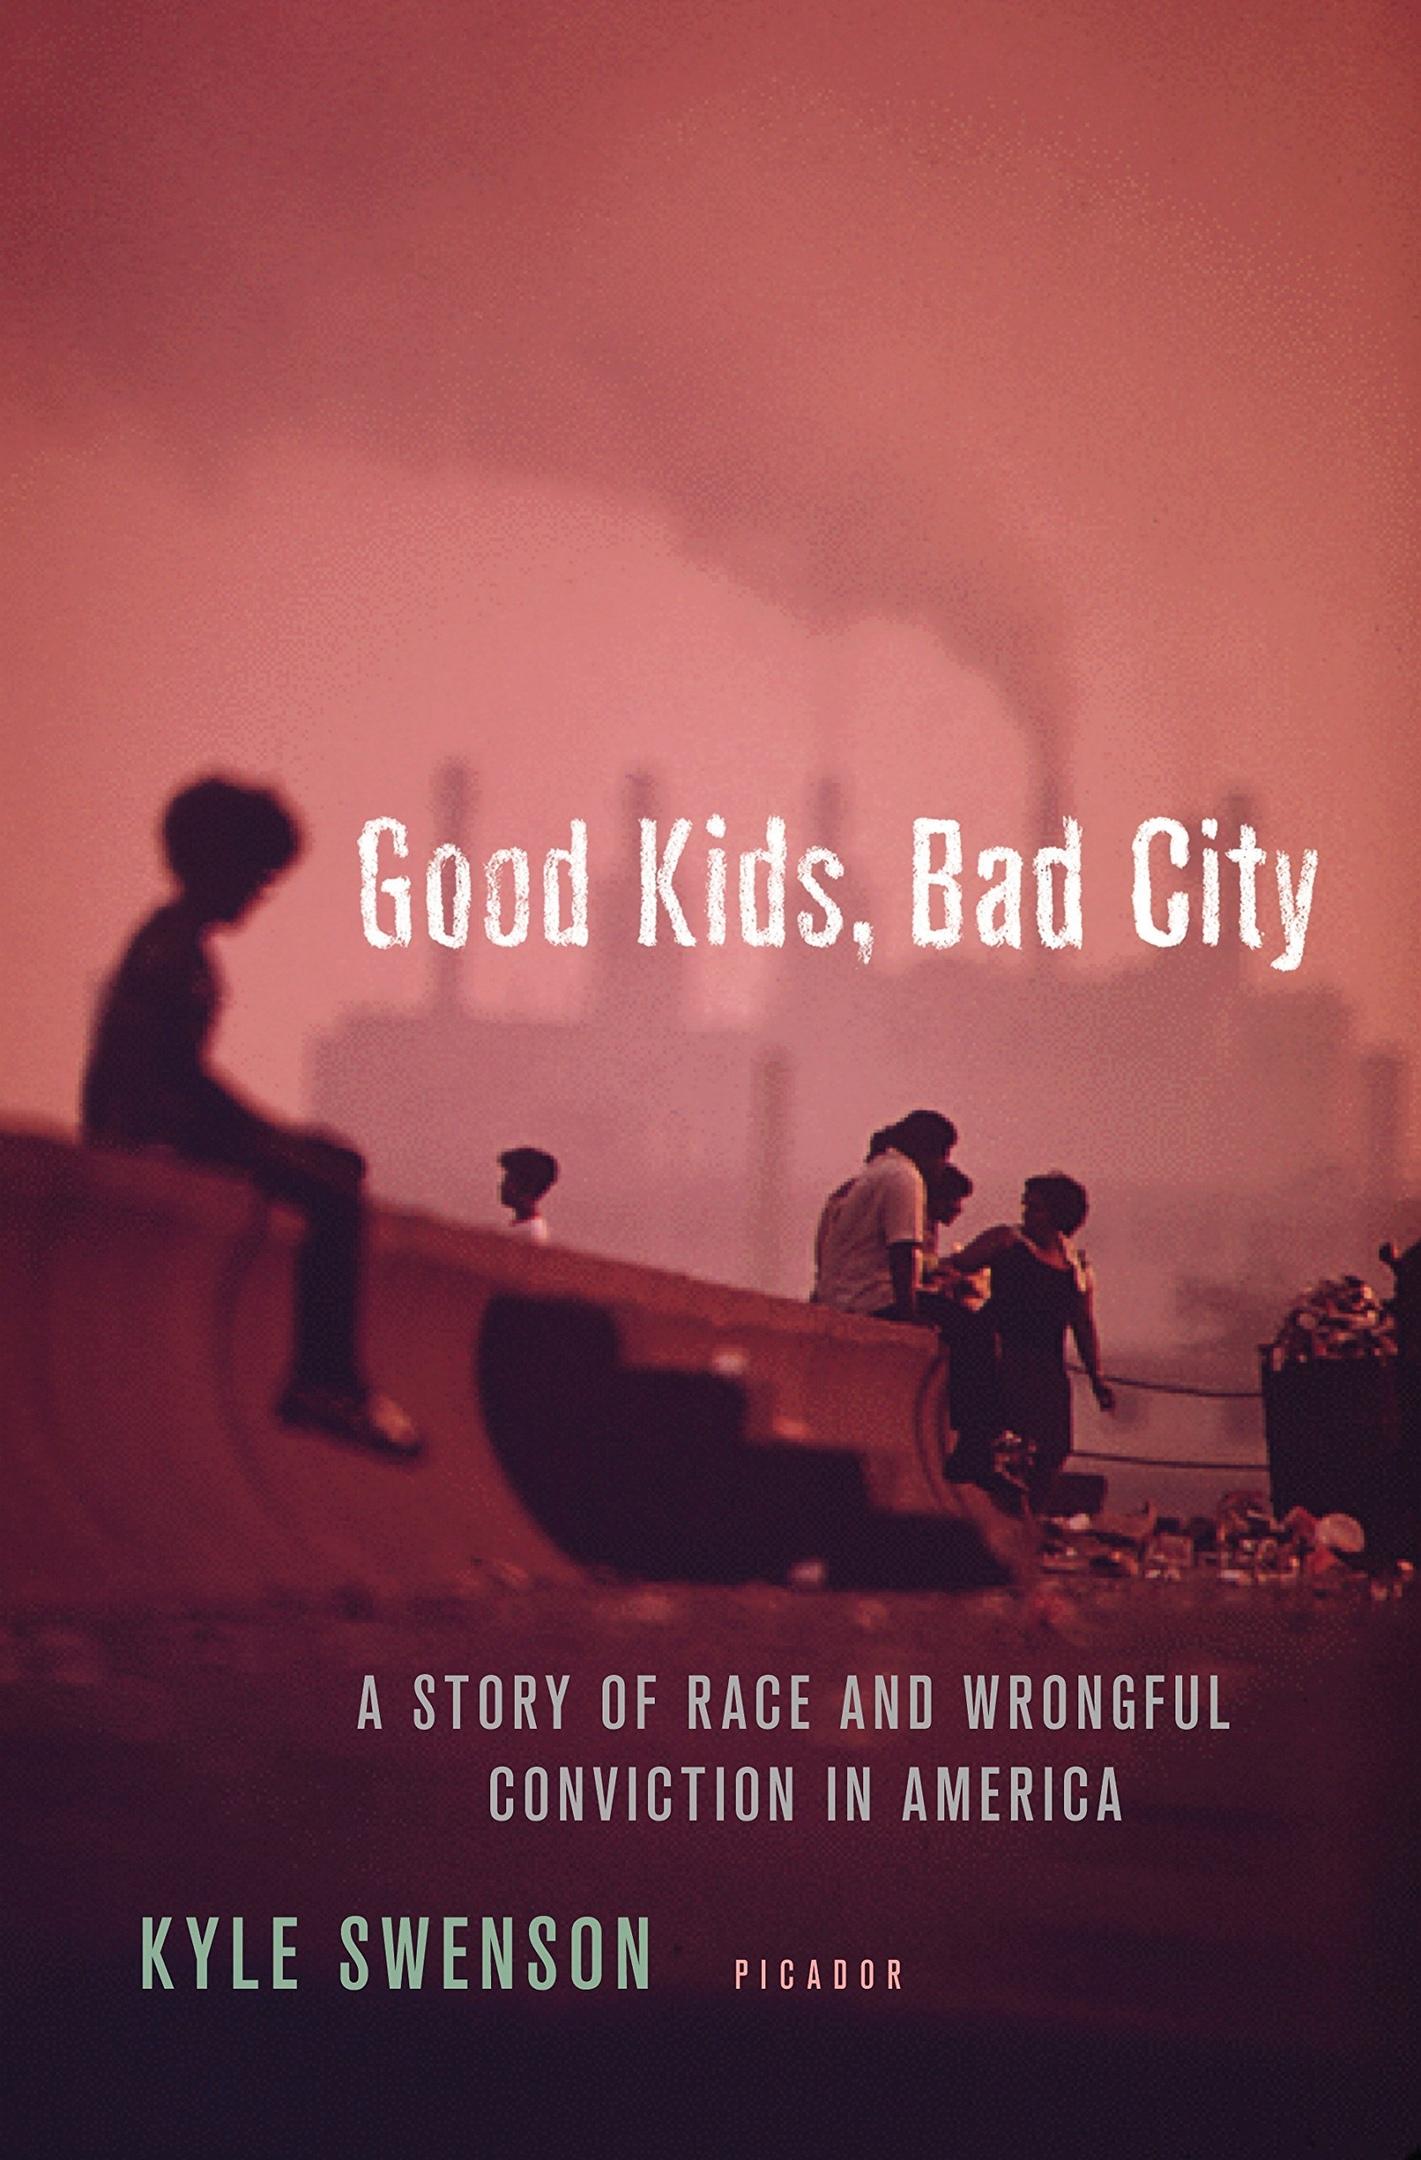 Kyle Swenson – Good Kids, Bad City